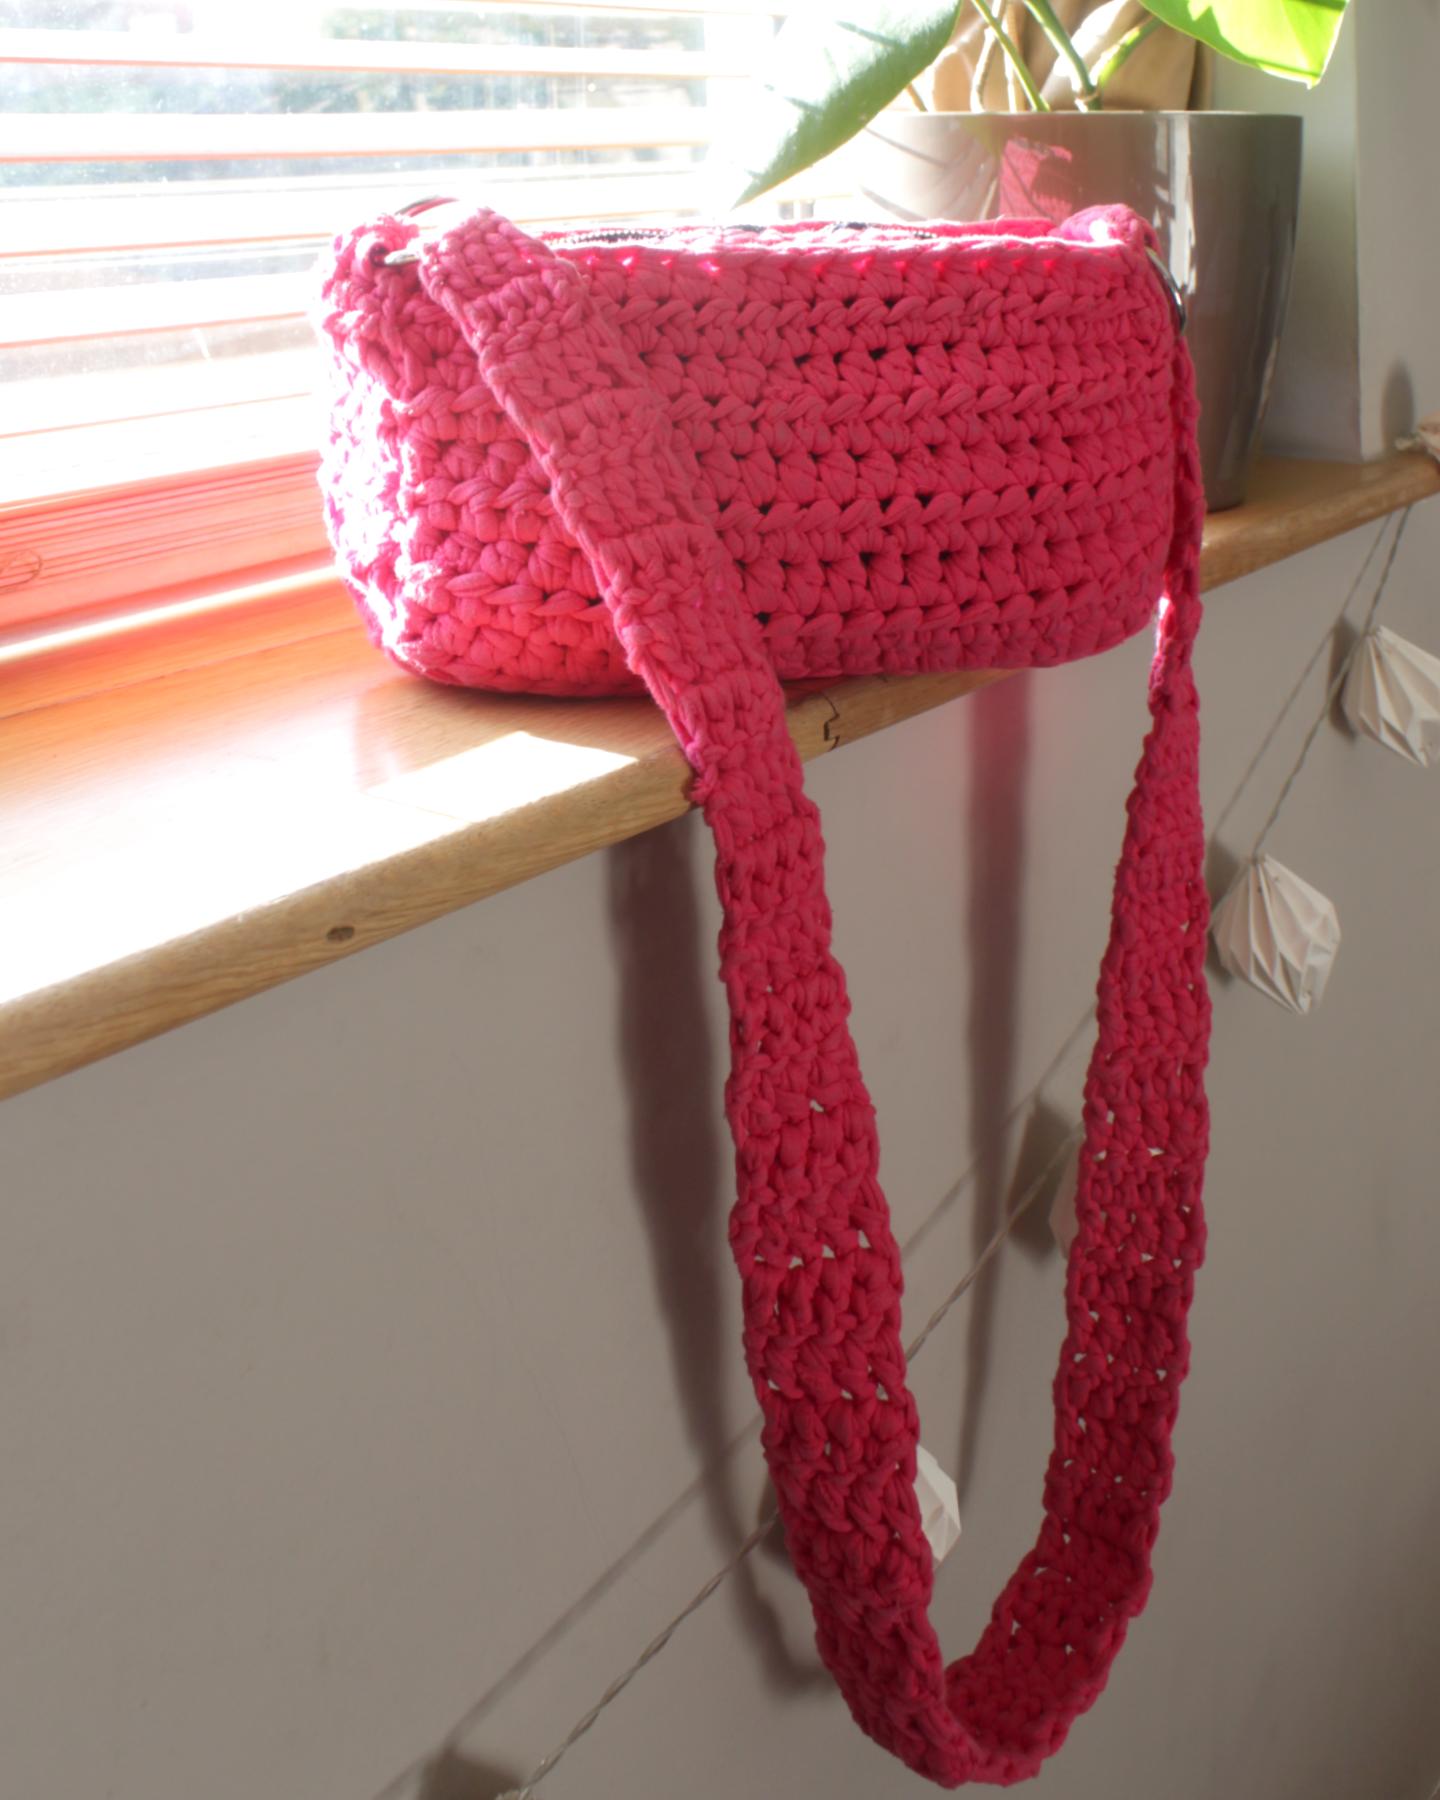 Easy To Make T-Shirt Yarn Crochet Shoulder Bag With Zip